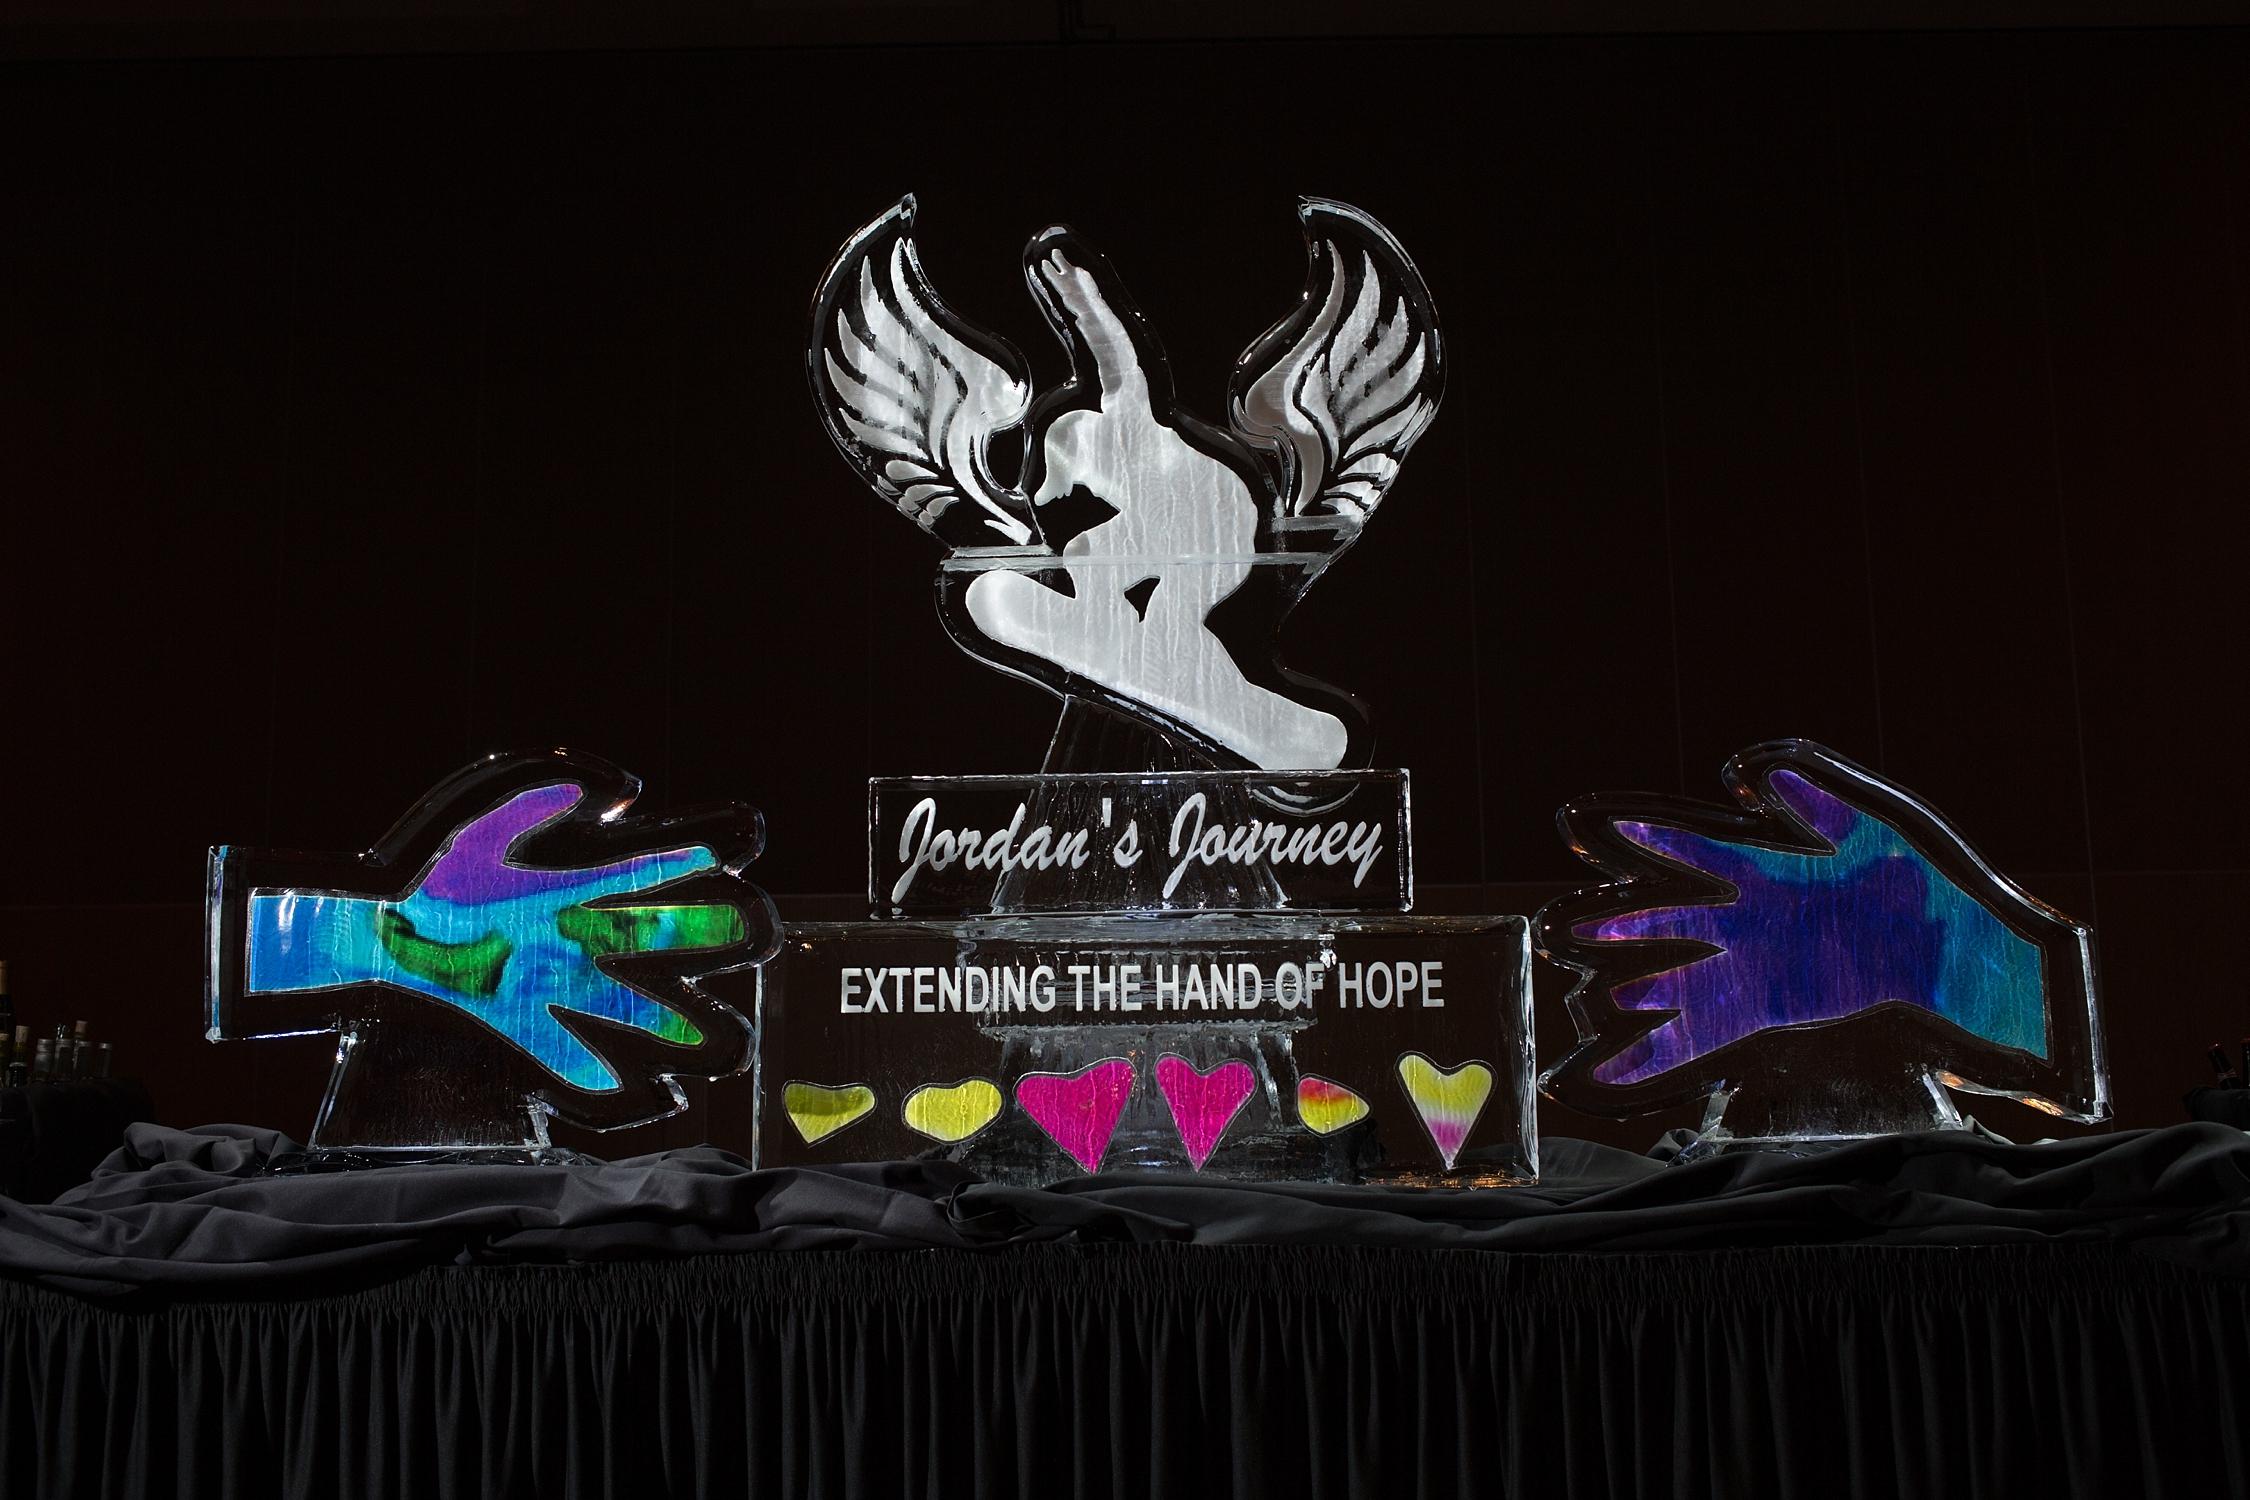 Custom Ice Sculpture with logo for fundraiser gala Jordan's Journey 2017 - Kate Lauren Studios